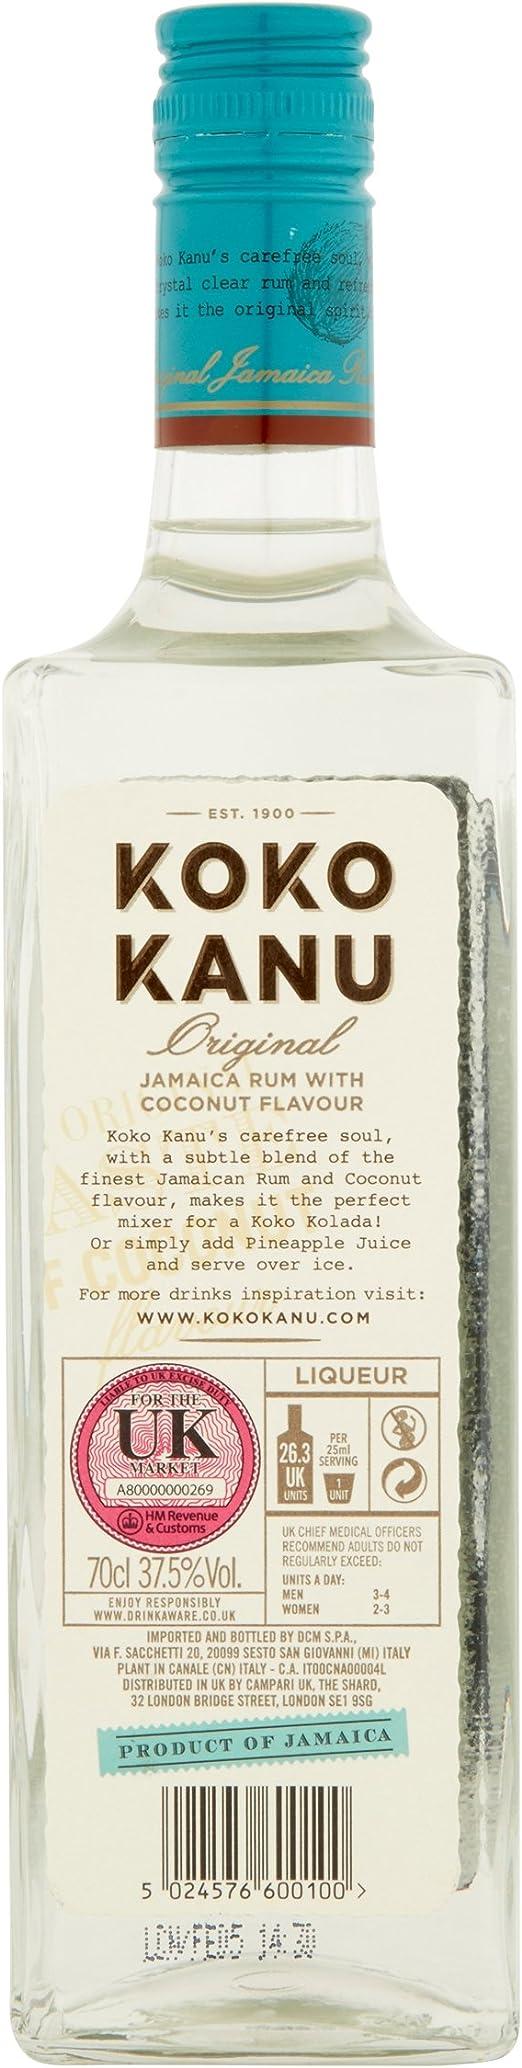 Koko Kanu Coconut Rum Likör (1 x 0.7 l): Amazon.es ...